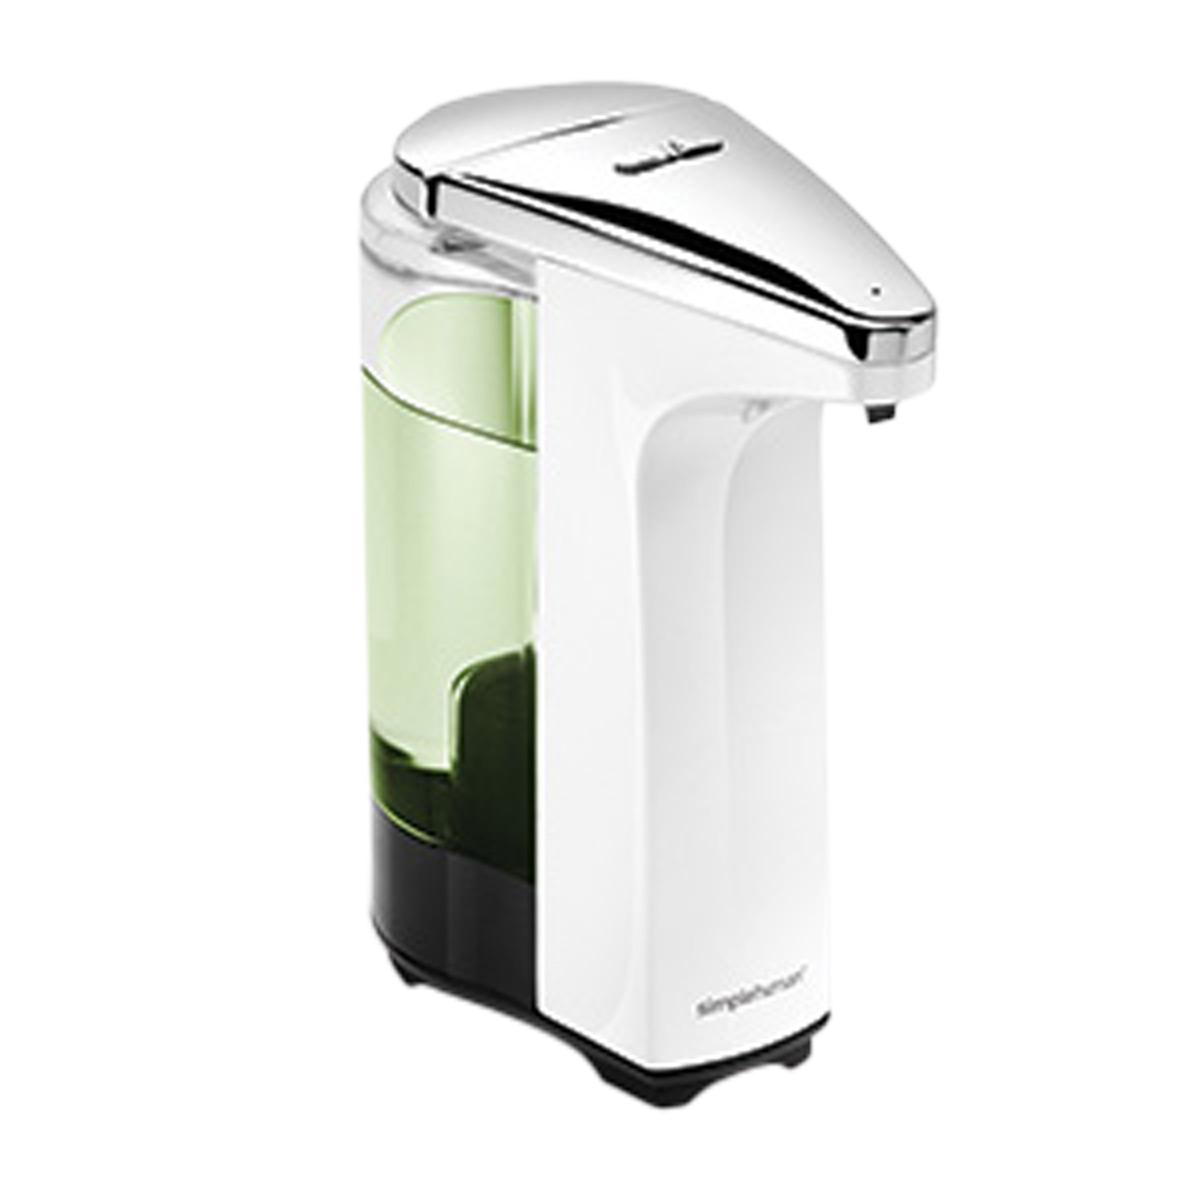 Touch-Free Sensor Soap Pump